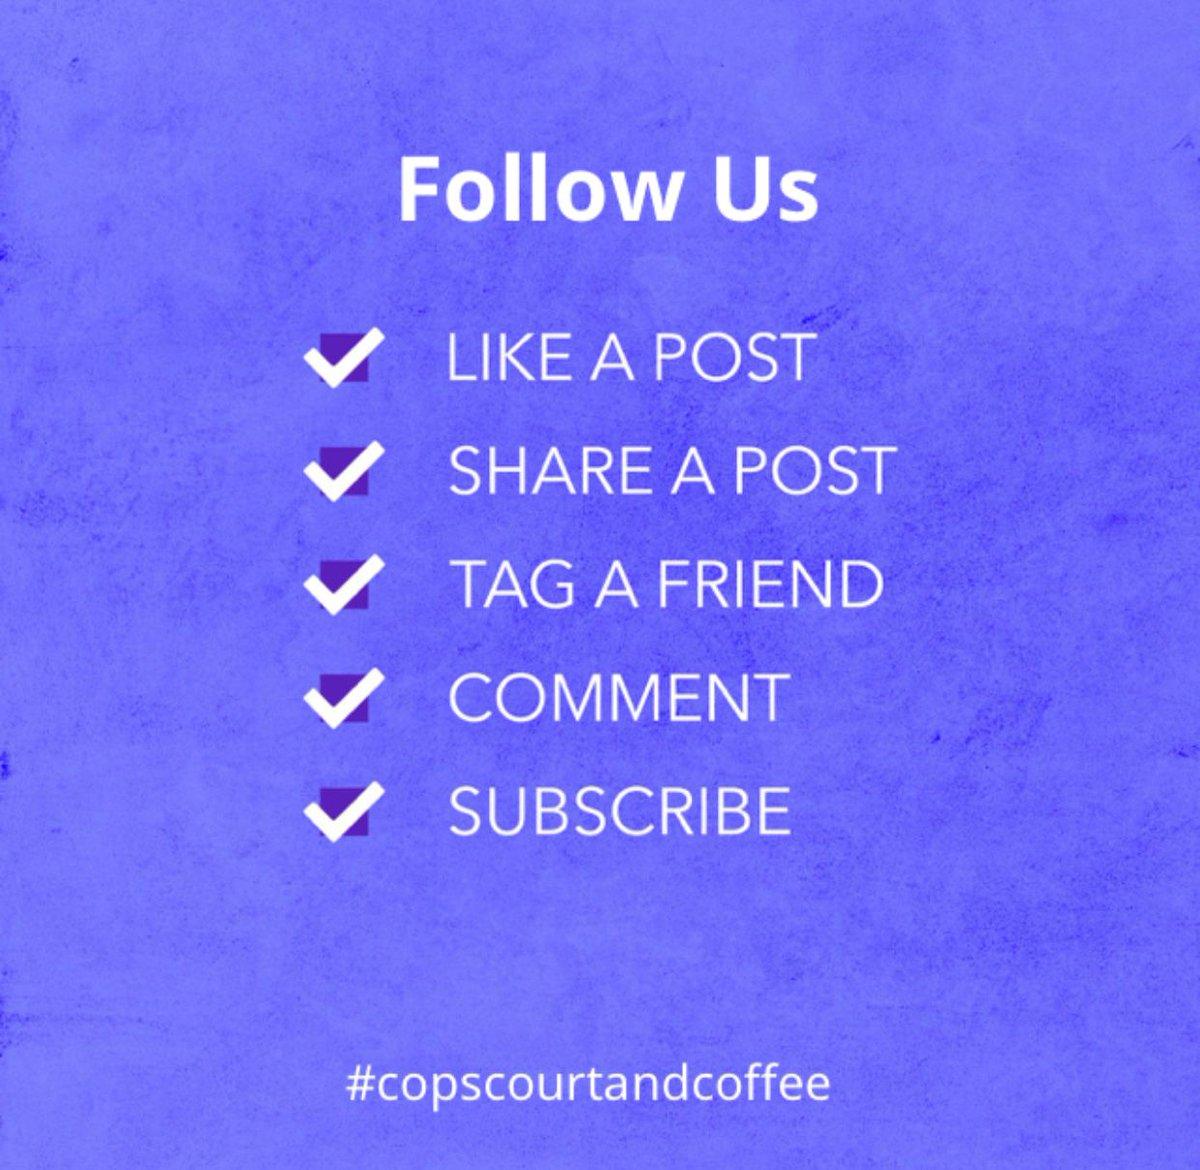 Like us, follow us, message us, tag us, dm us! Let's get social! #follow #like #love #followme #instagram #likeforlikes #likes #photooftheday #followforfollowback #picoftheday #followback #me #happy #likeforfollow #followers #bhfyp #life